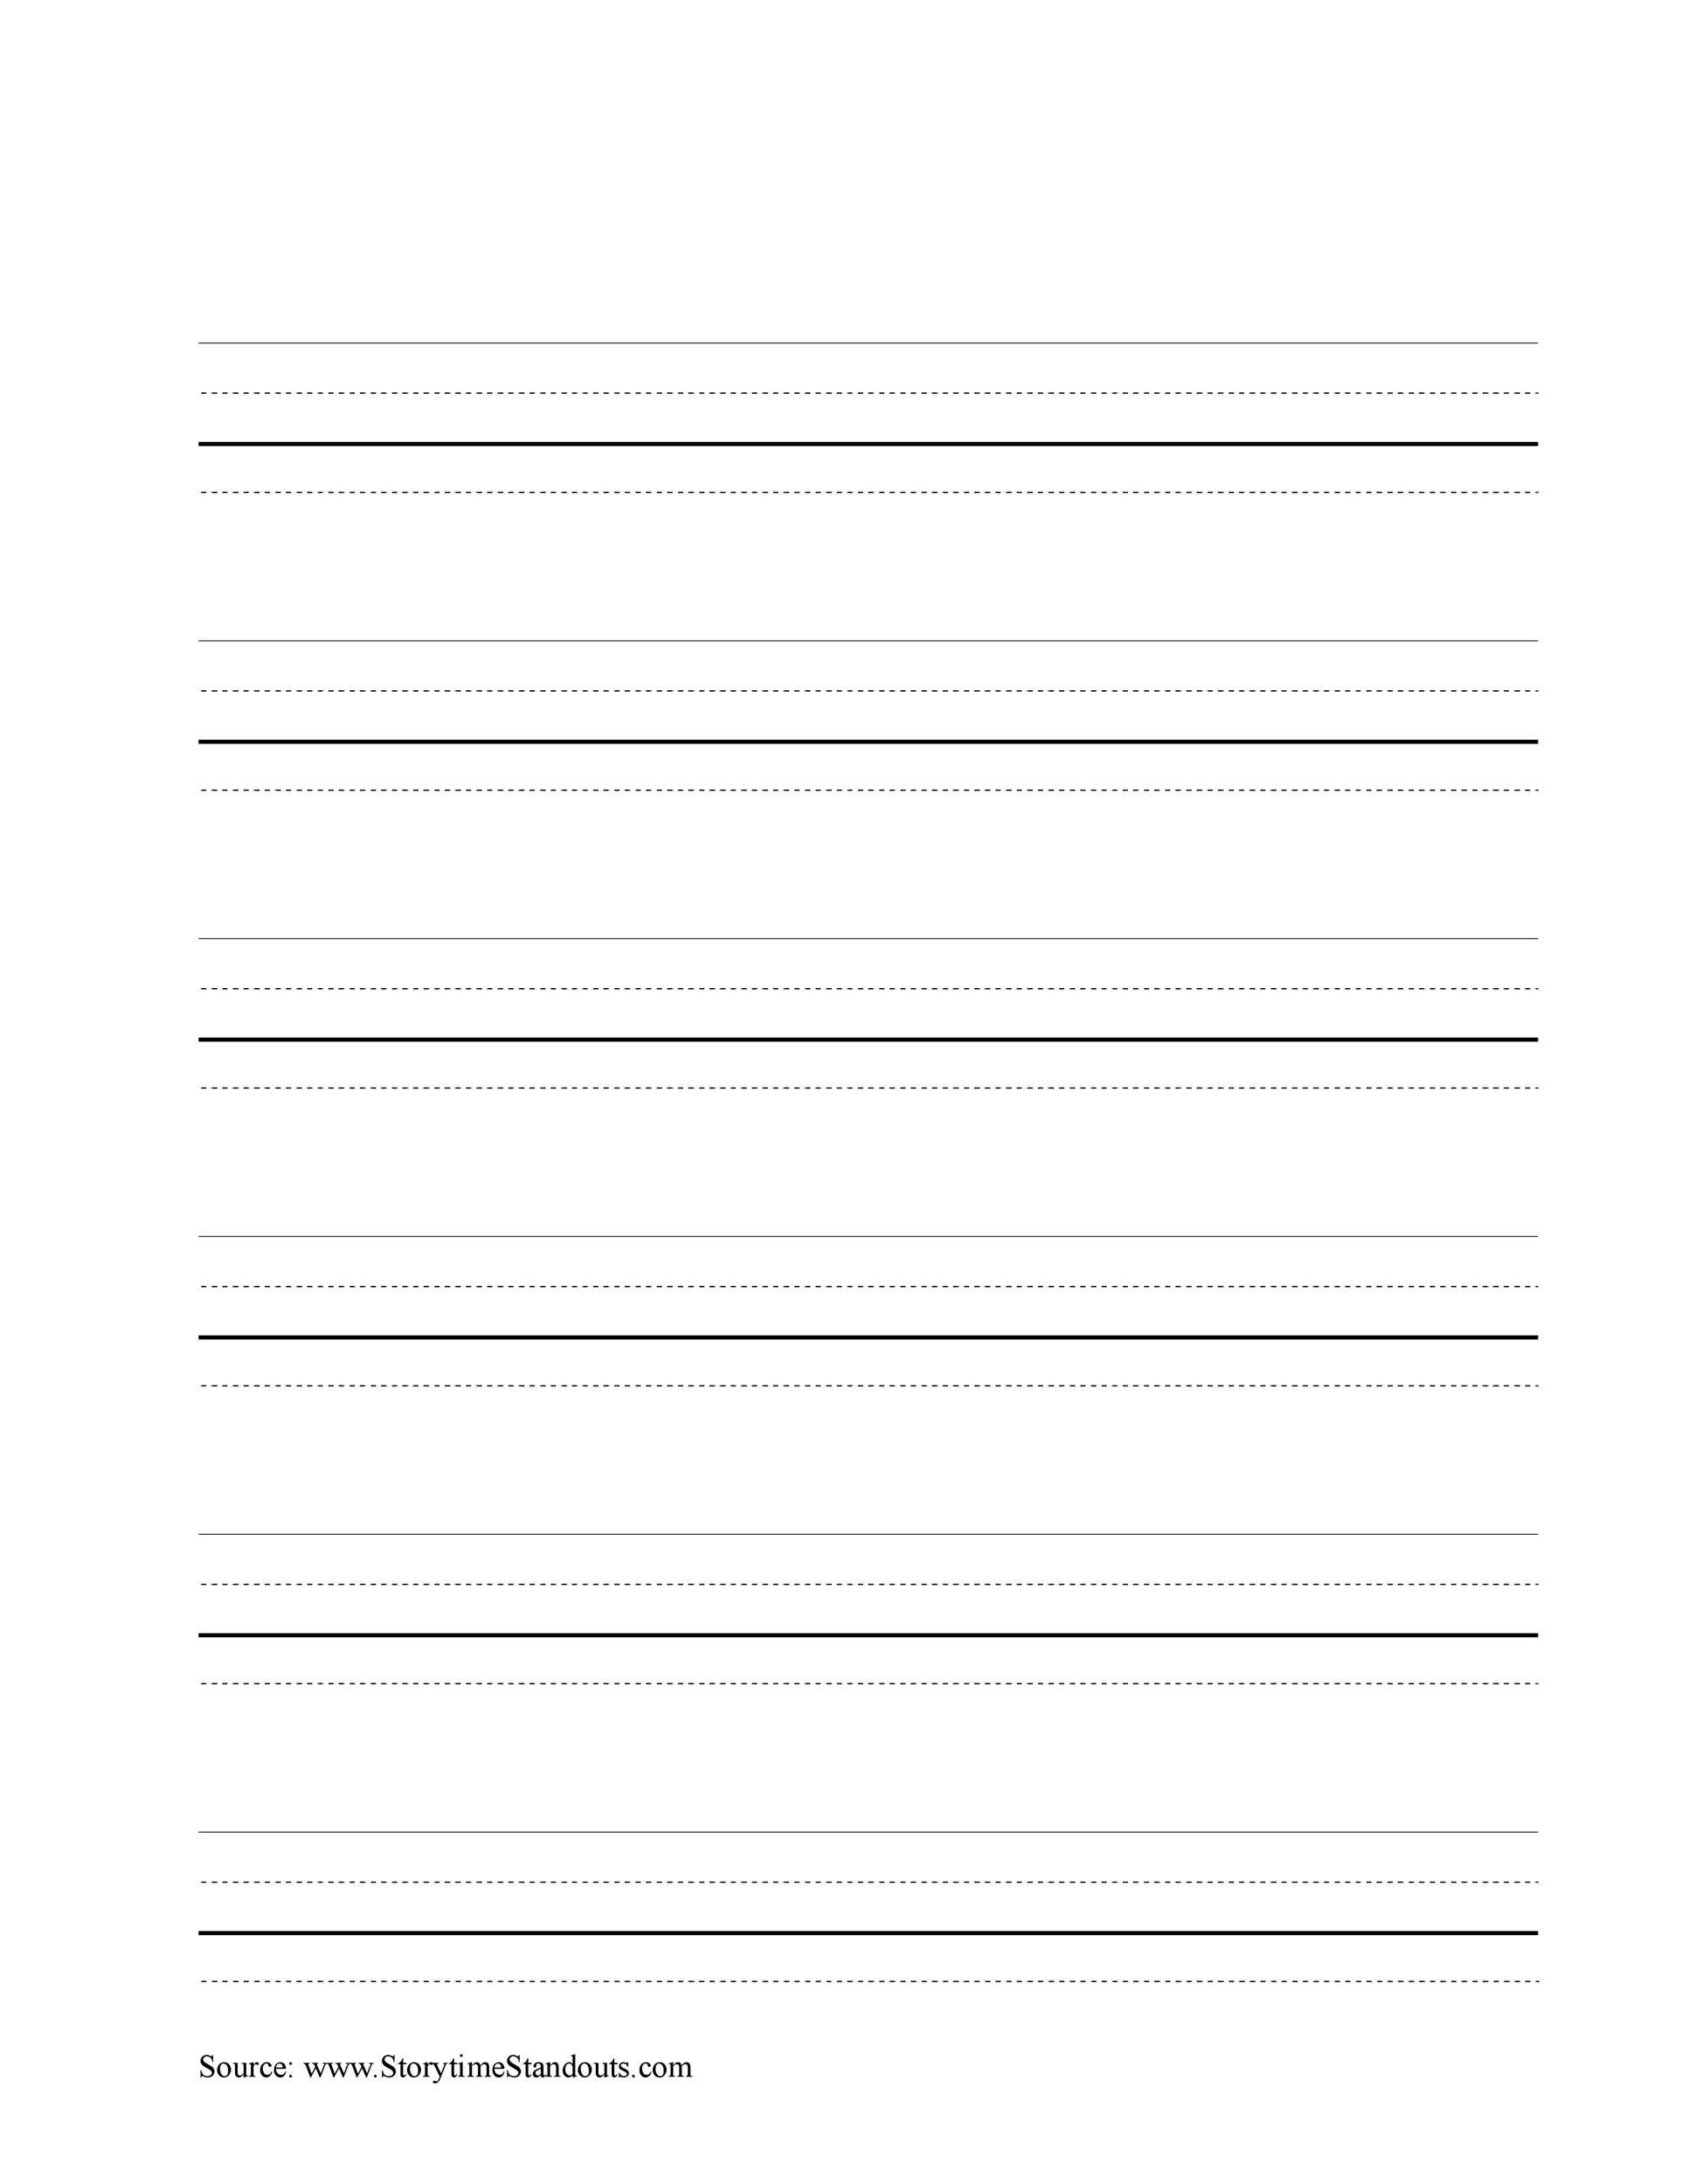 free line paper template - Pinarkubkireklamowe